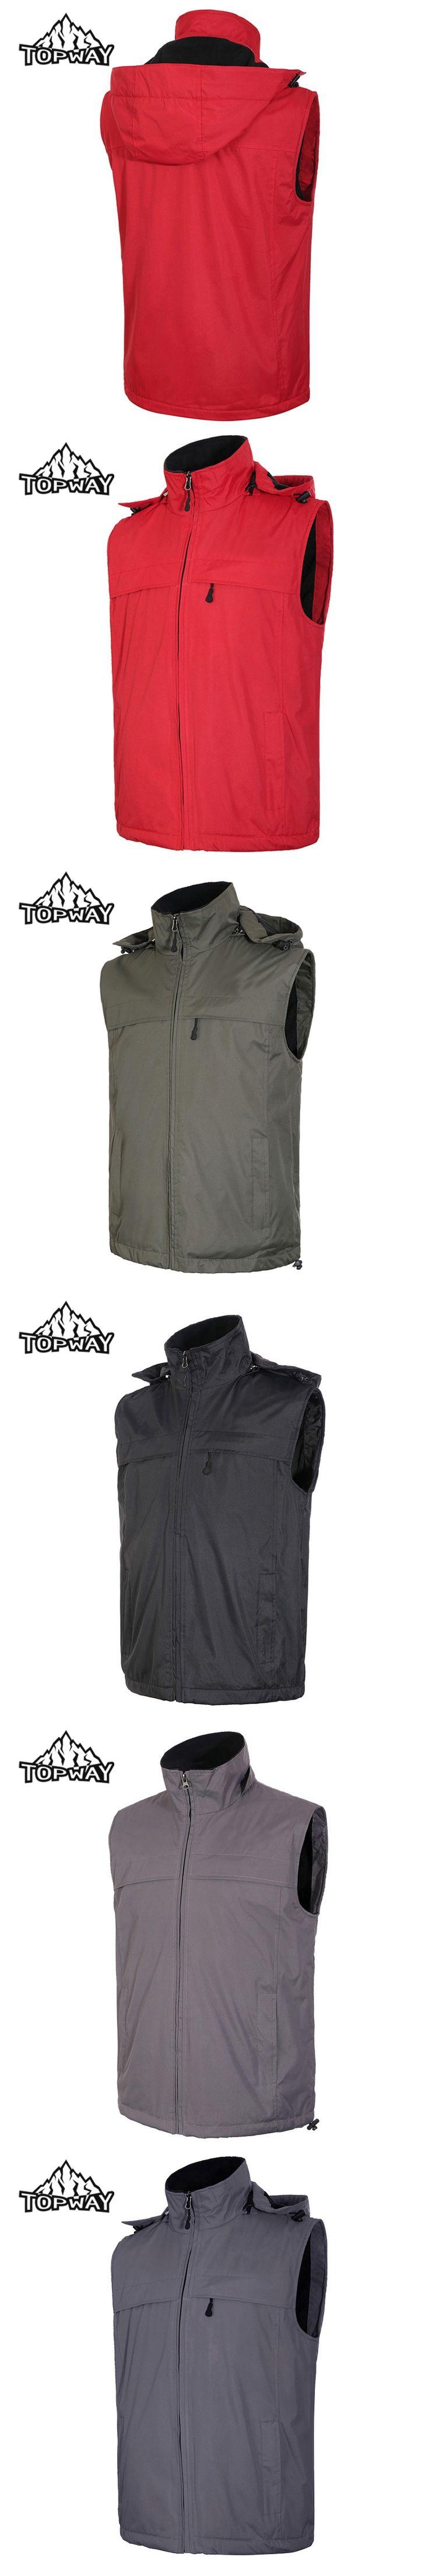 2017 New Thermal Fleece Lining Chaleco Hombre Softshell Water Resistant Sleeveless Bodywarmer  Gilet Waistcoat Vest Men